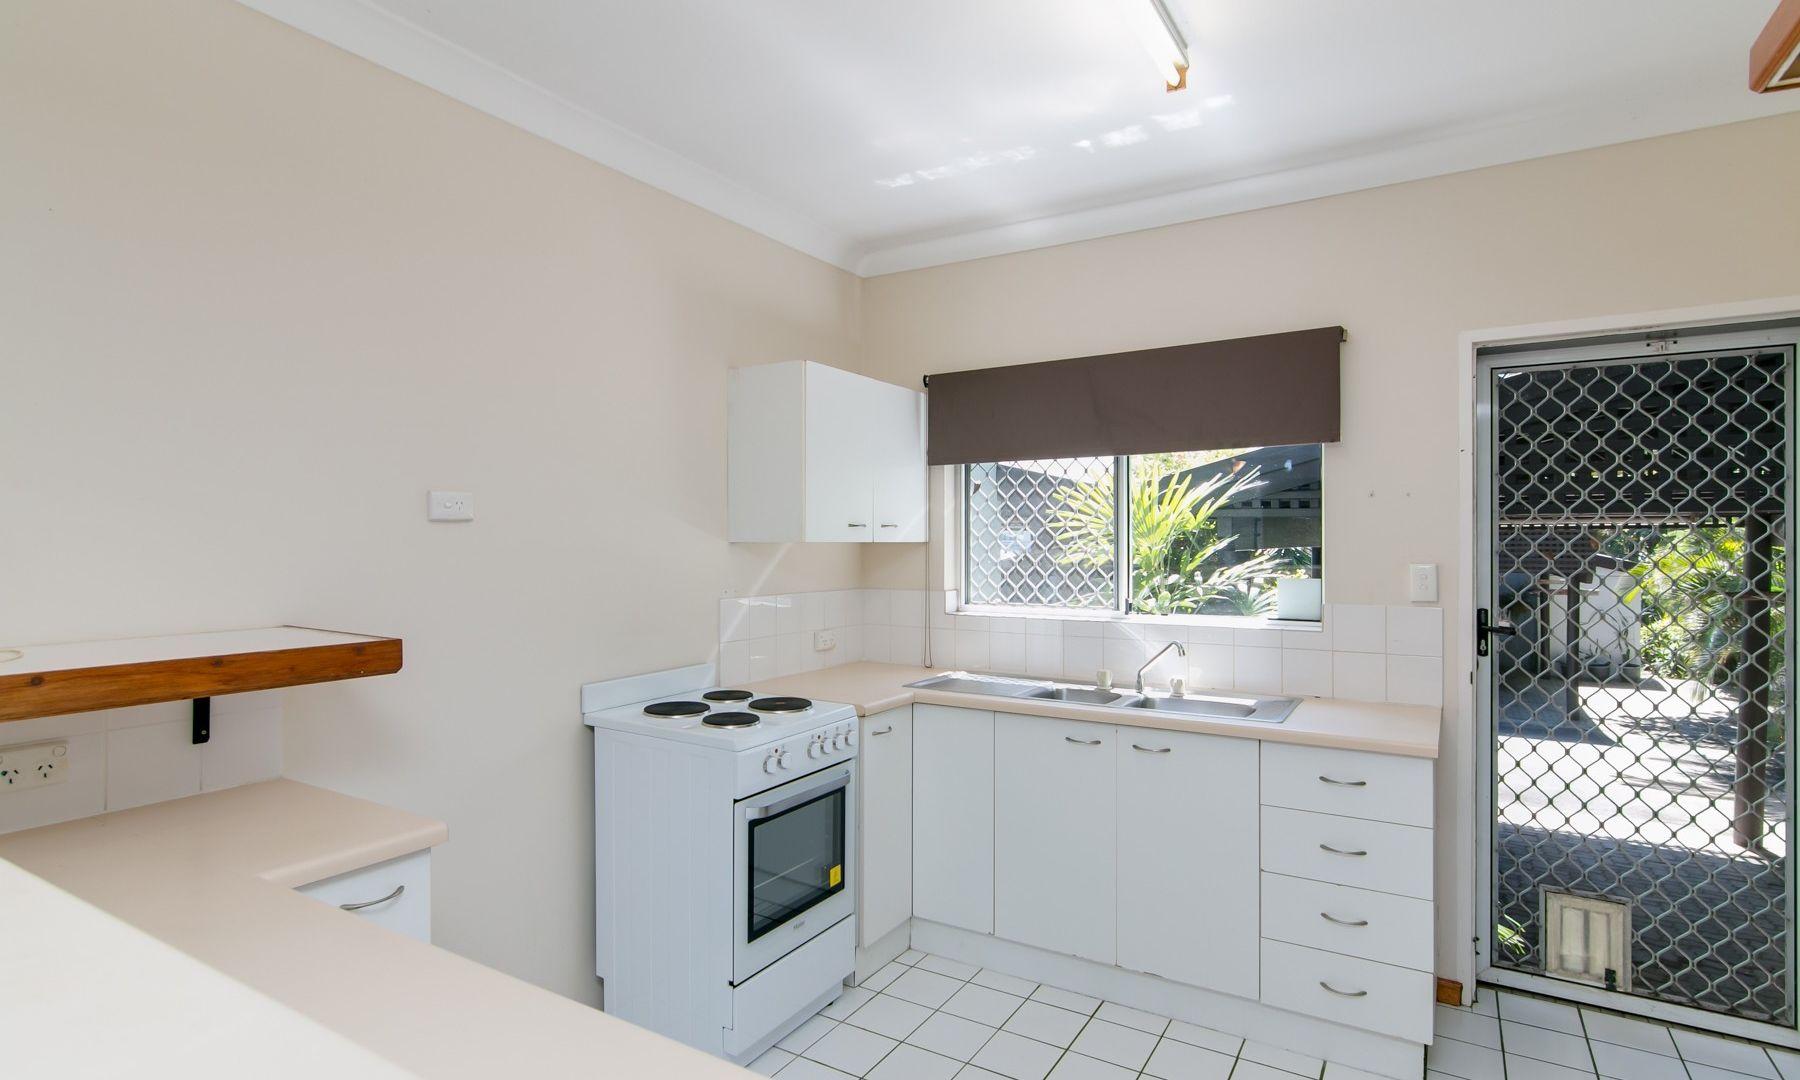 14/17-19 Marett Street, Stratford QLD 4870, Image 2